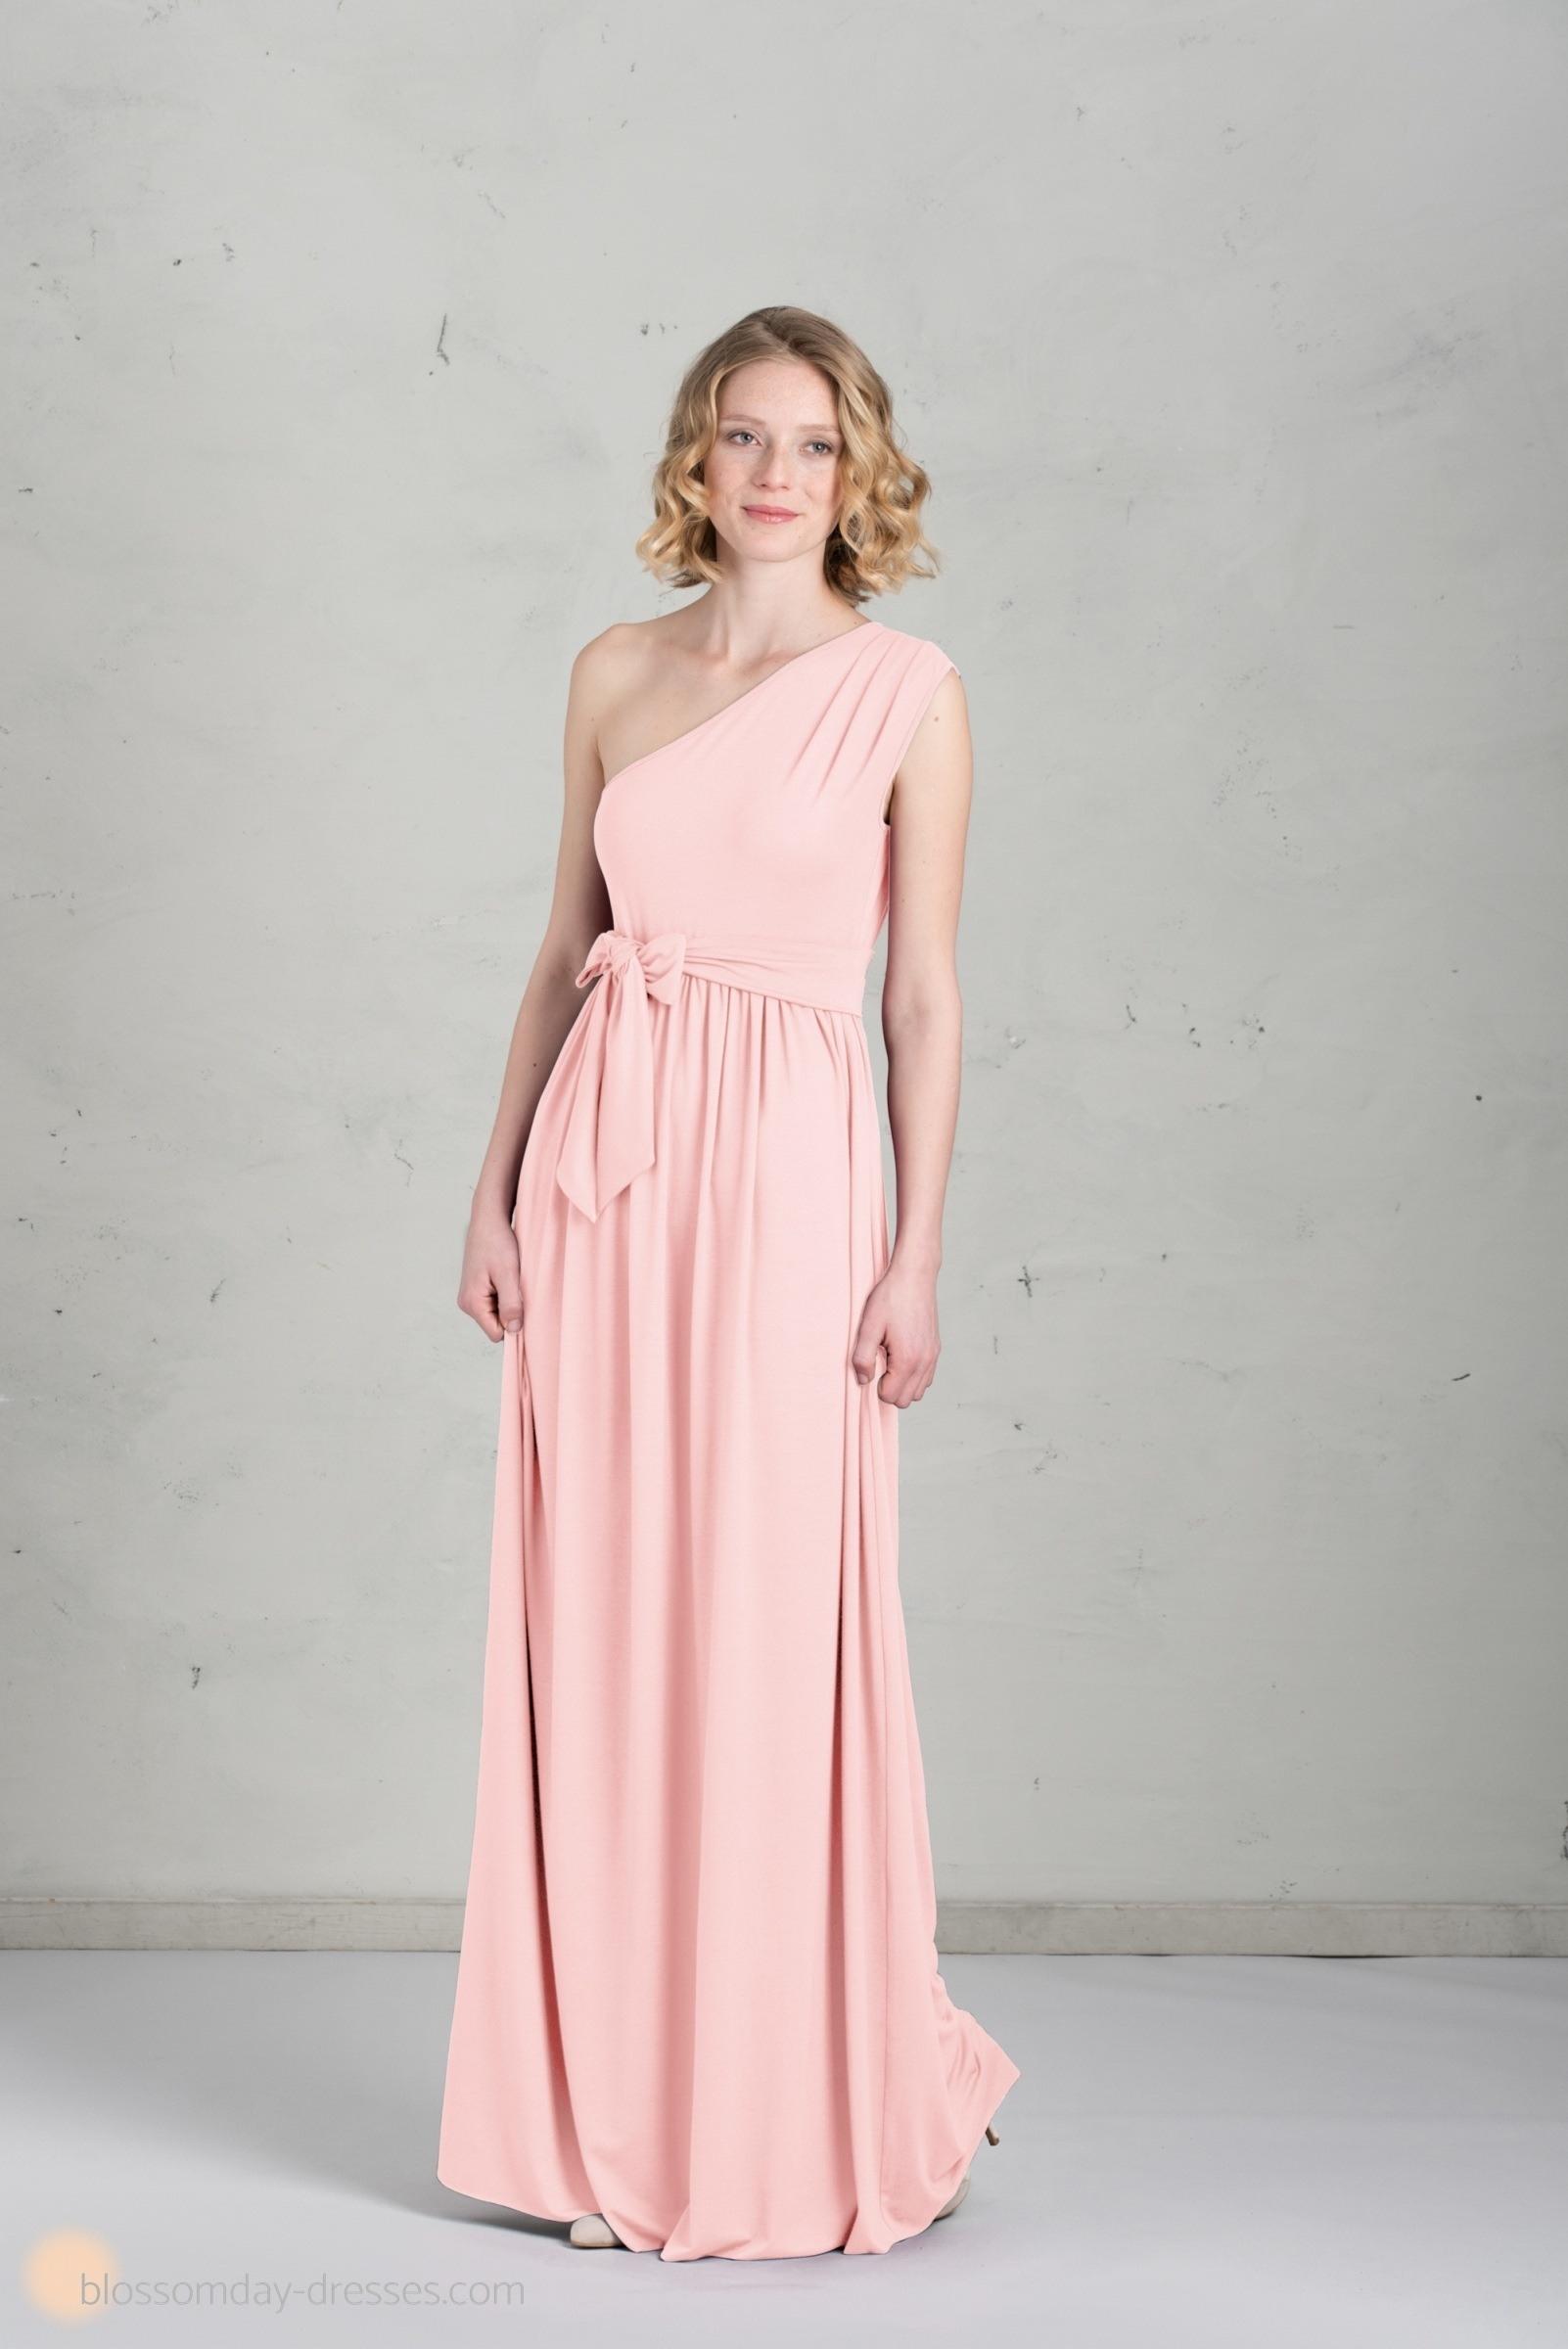 17 Wunderbar Rosa Kleid Lang Bester PreisDesigner Genial Rosa Kleid Lang Bester Preis